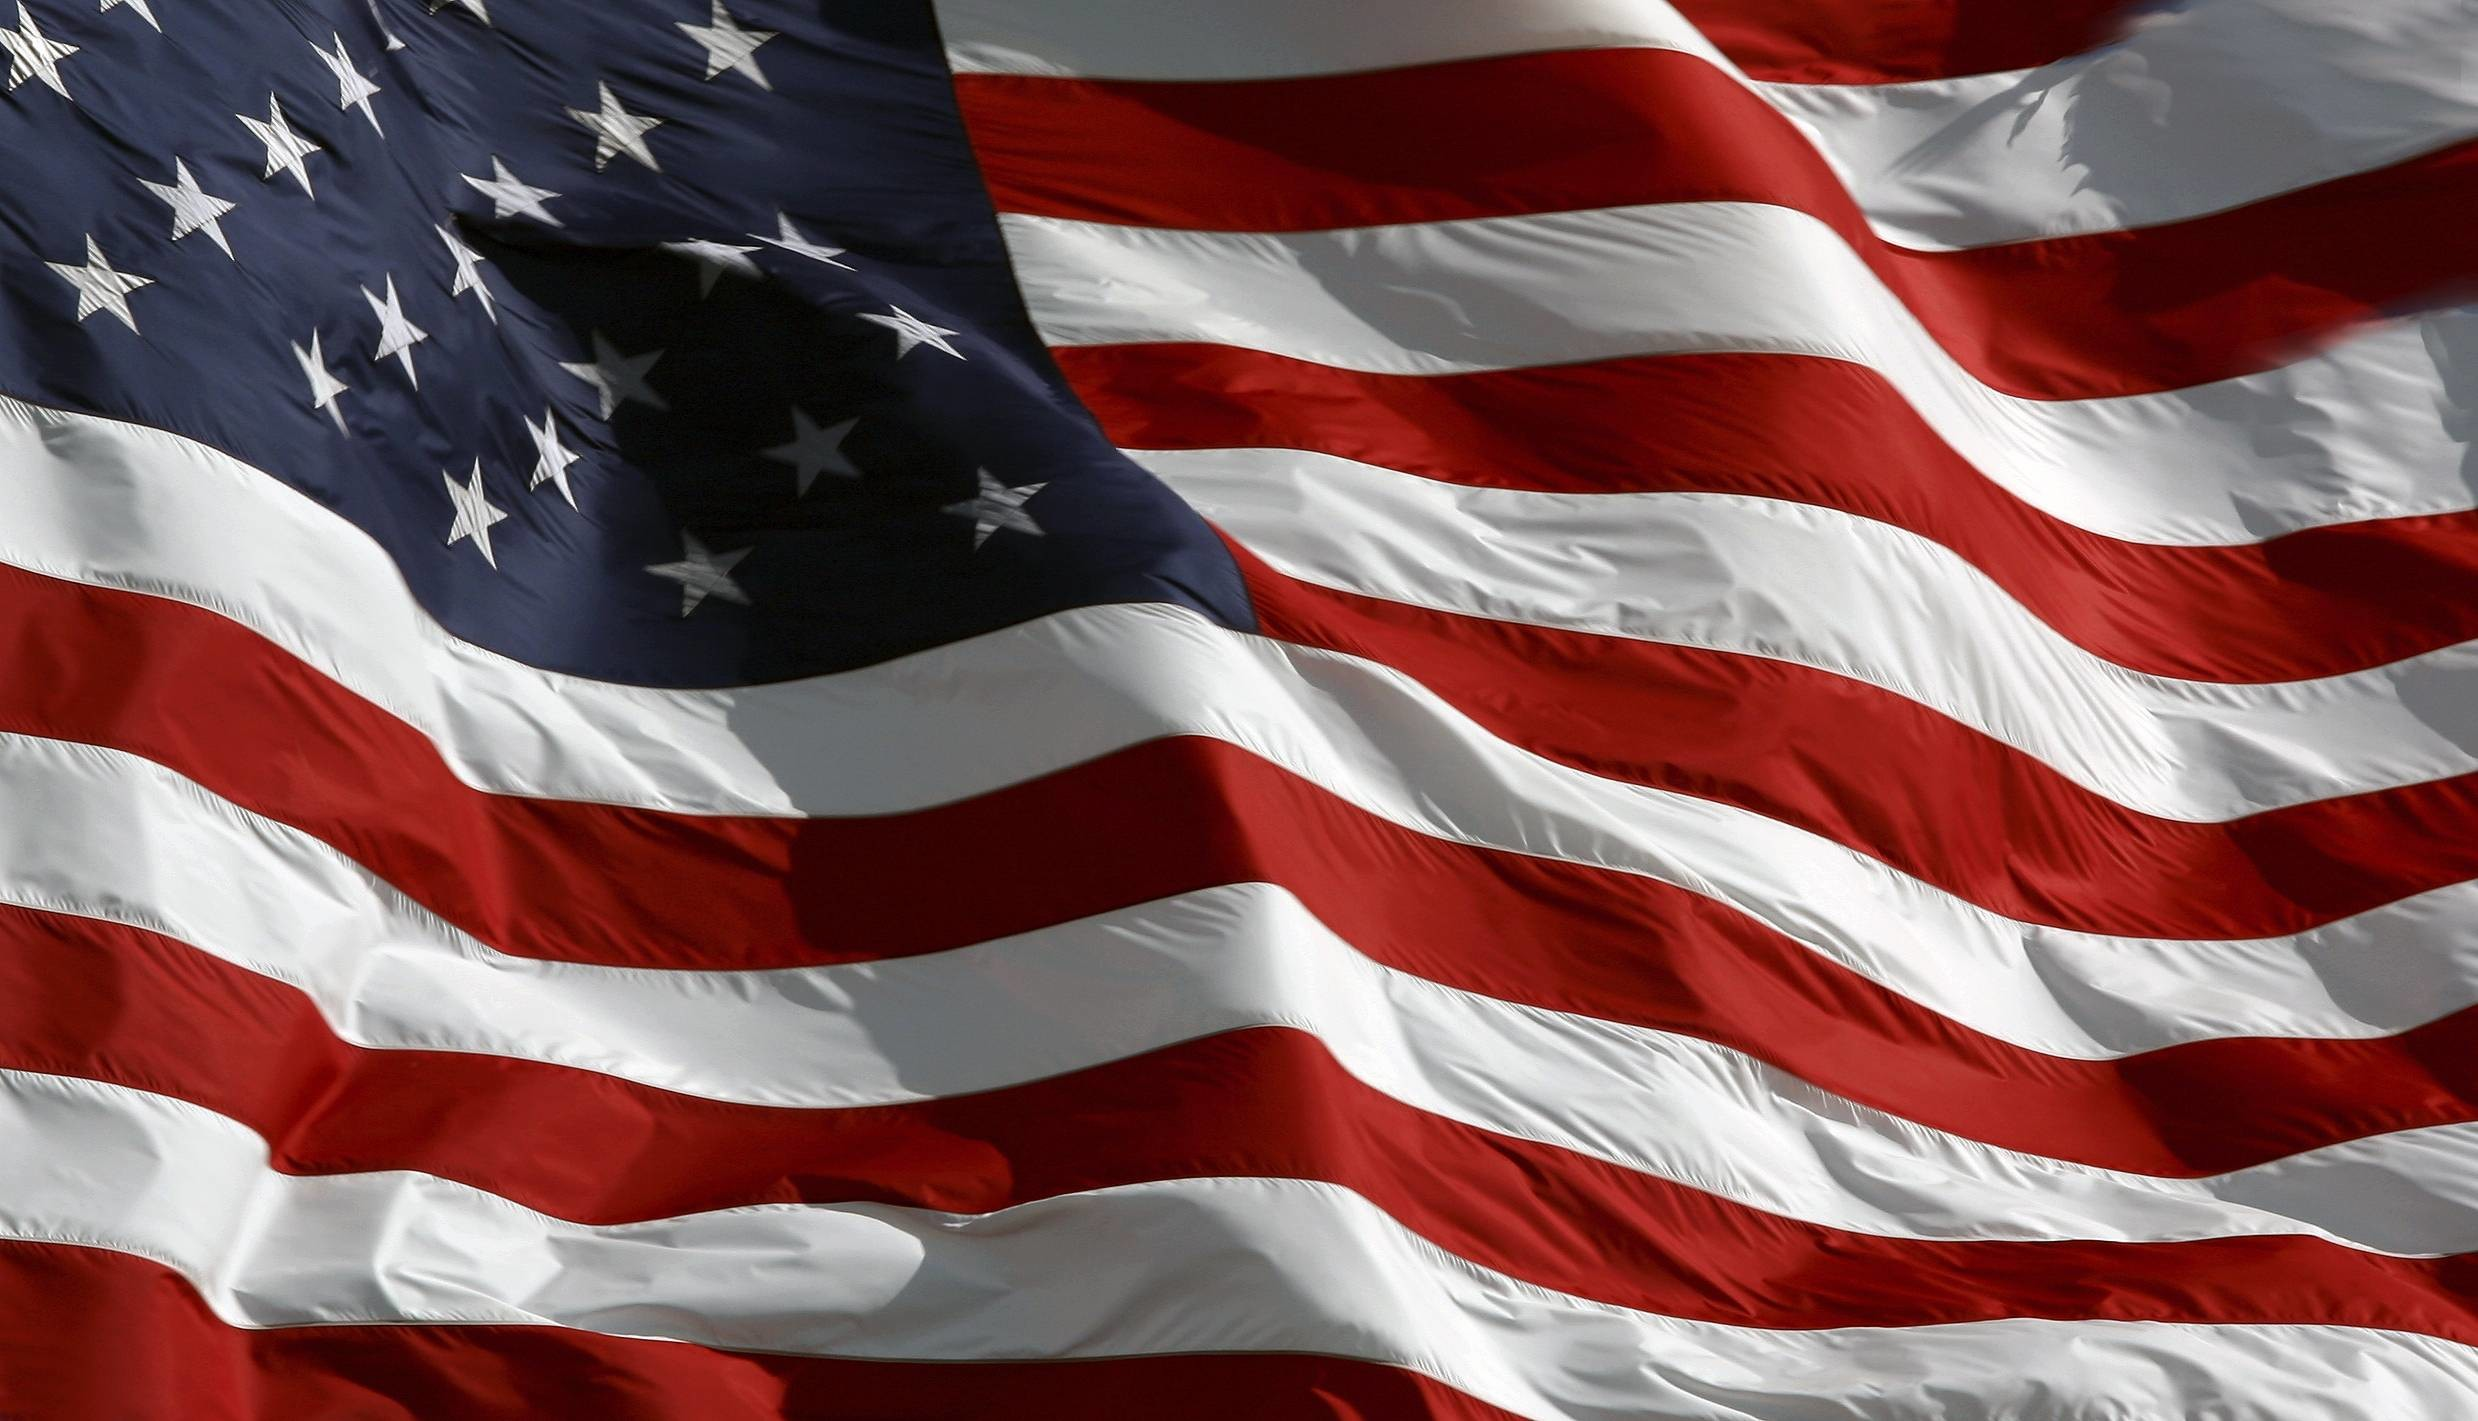 American Flag Background Wallpaper | Wallpaper Download